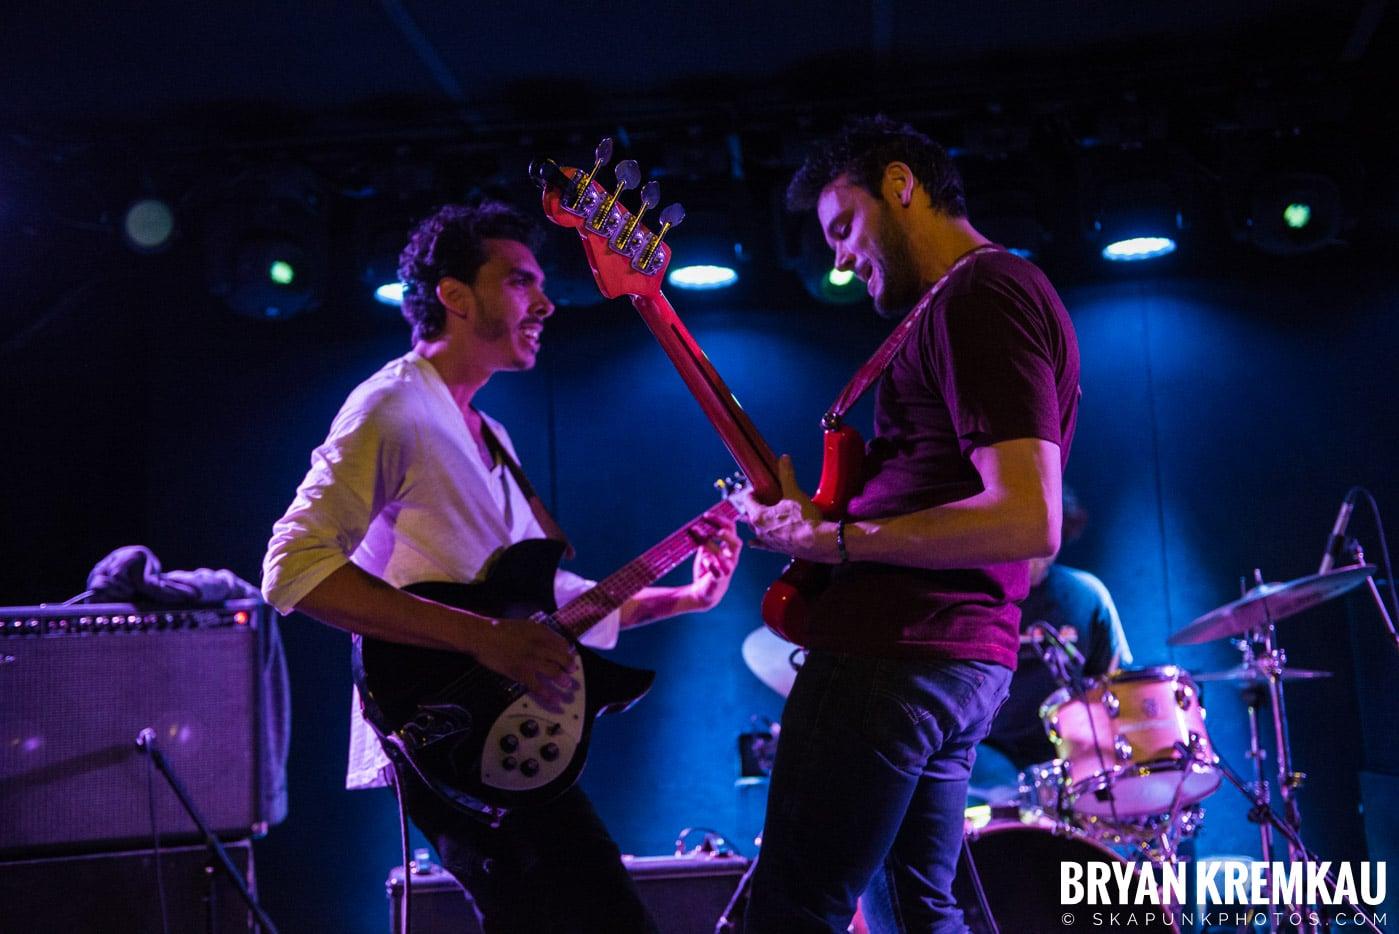 Hot Curl @ Mercury Lounge, NYC - 3.10.17 (2)